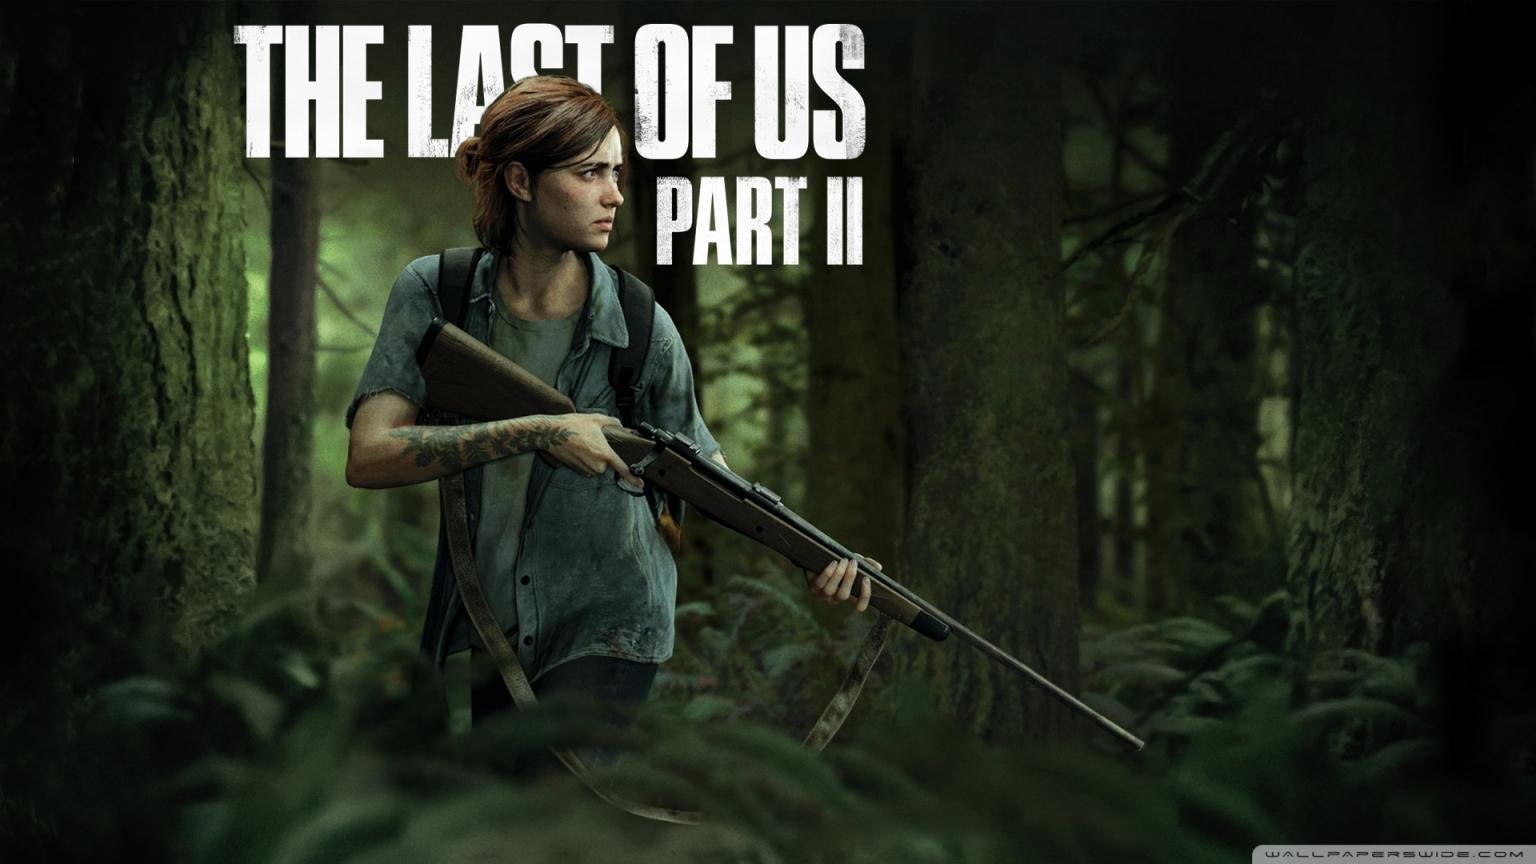 download The Last Of Us Part 2 4K HD Desktop Wallpaper for 4K 1536x864